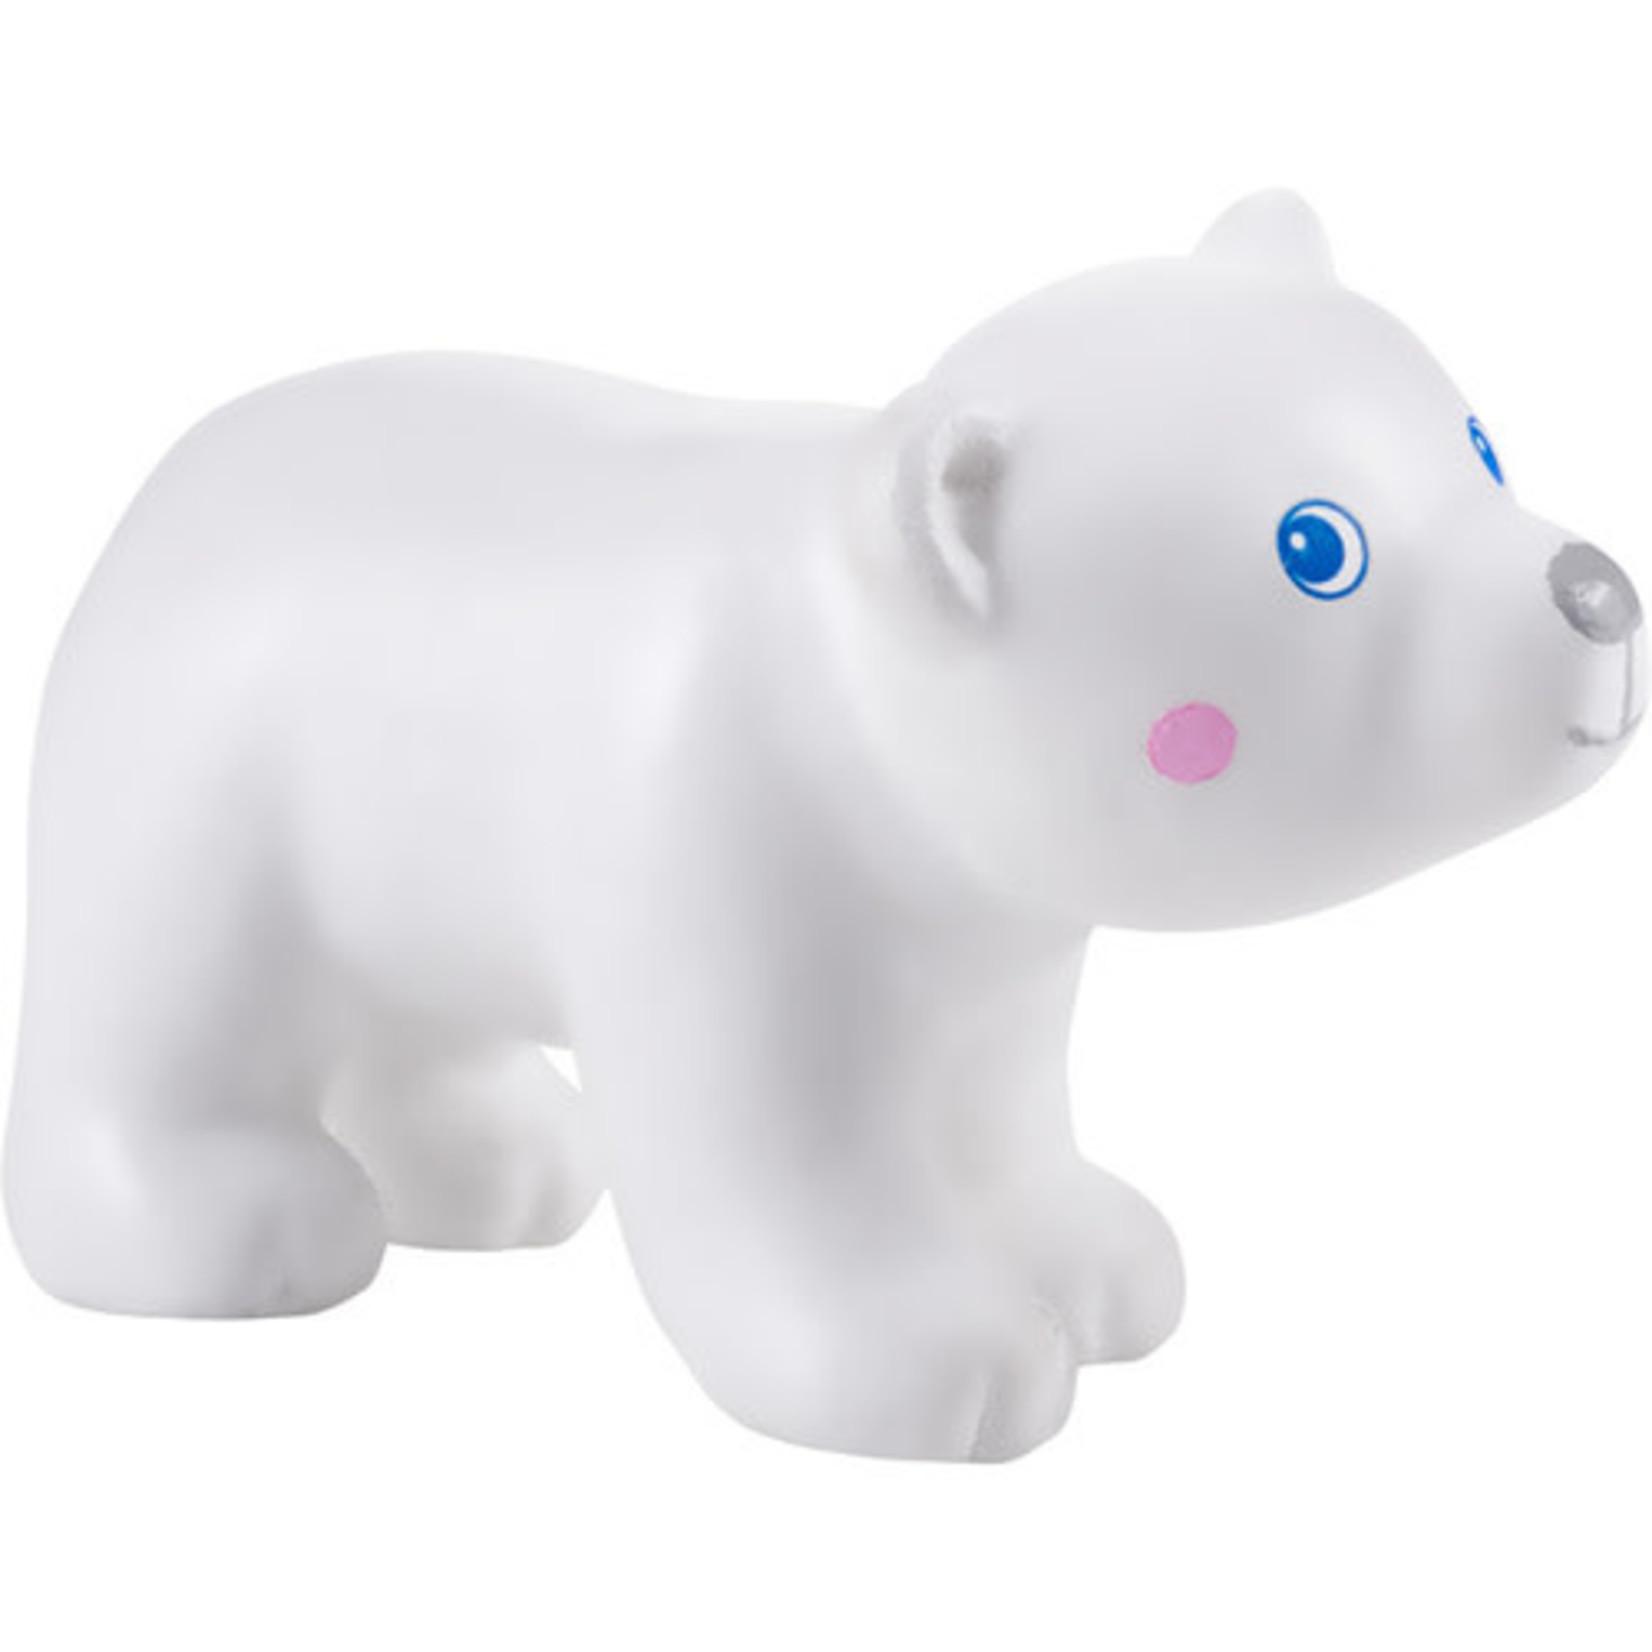 Haba Little Friends - Polar Bear Baby